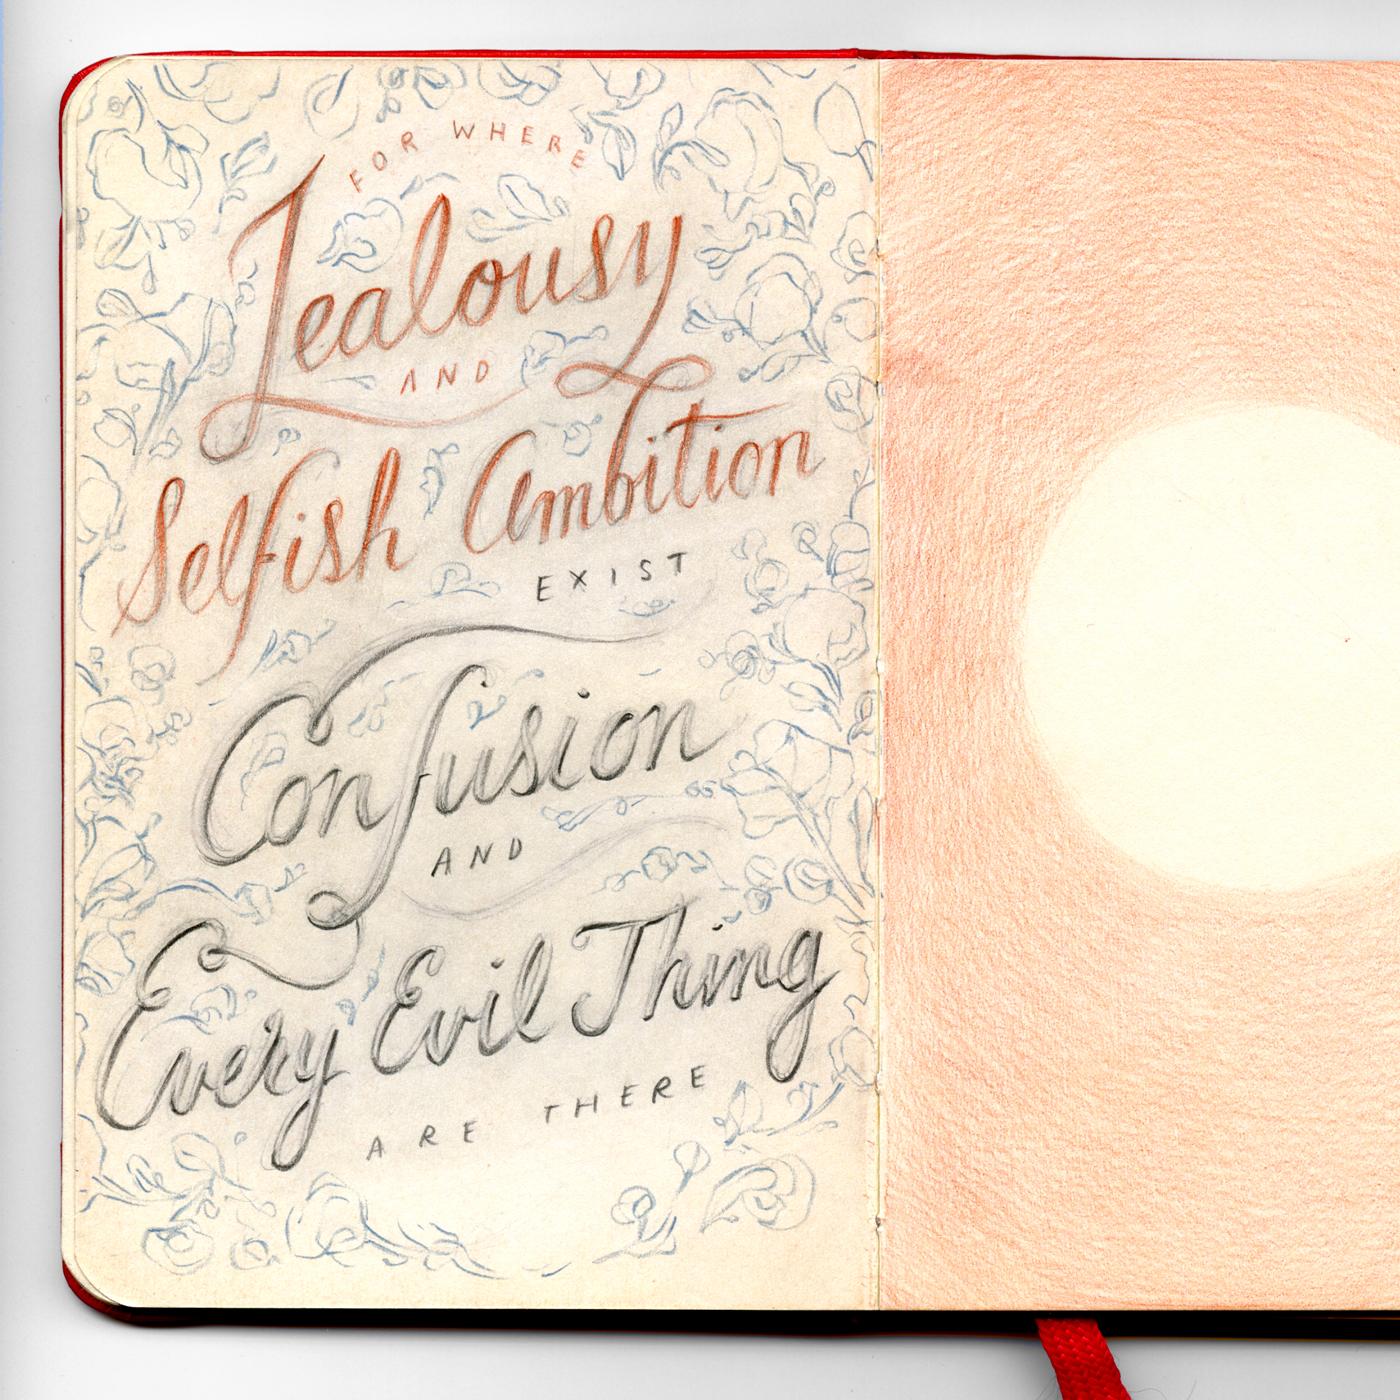 Italy-Red-sketchbook-jealousy.jpg